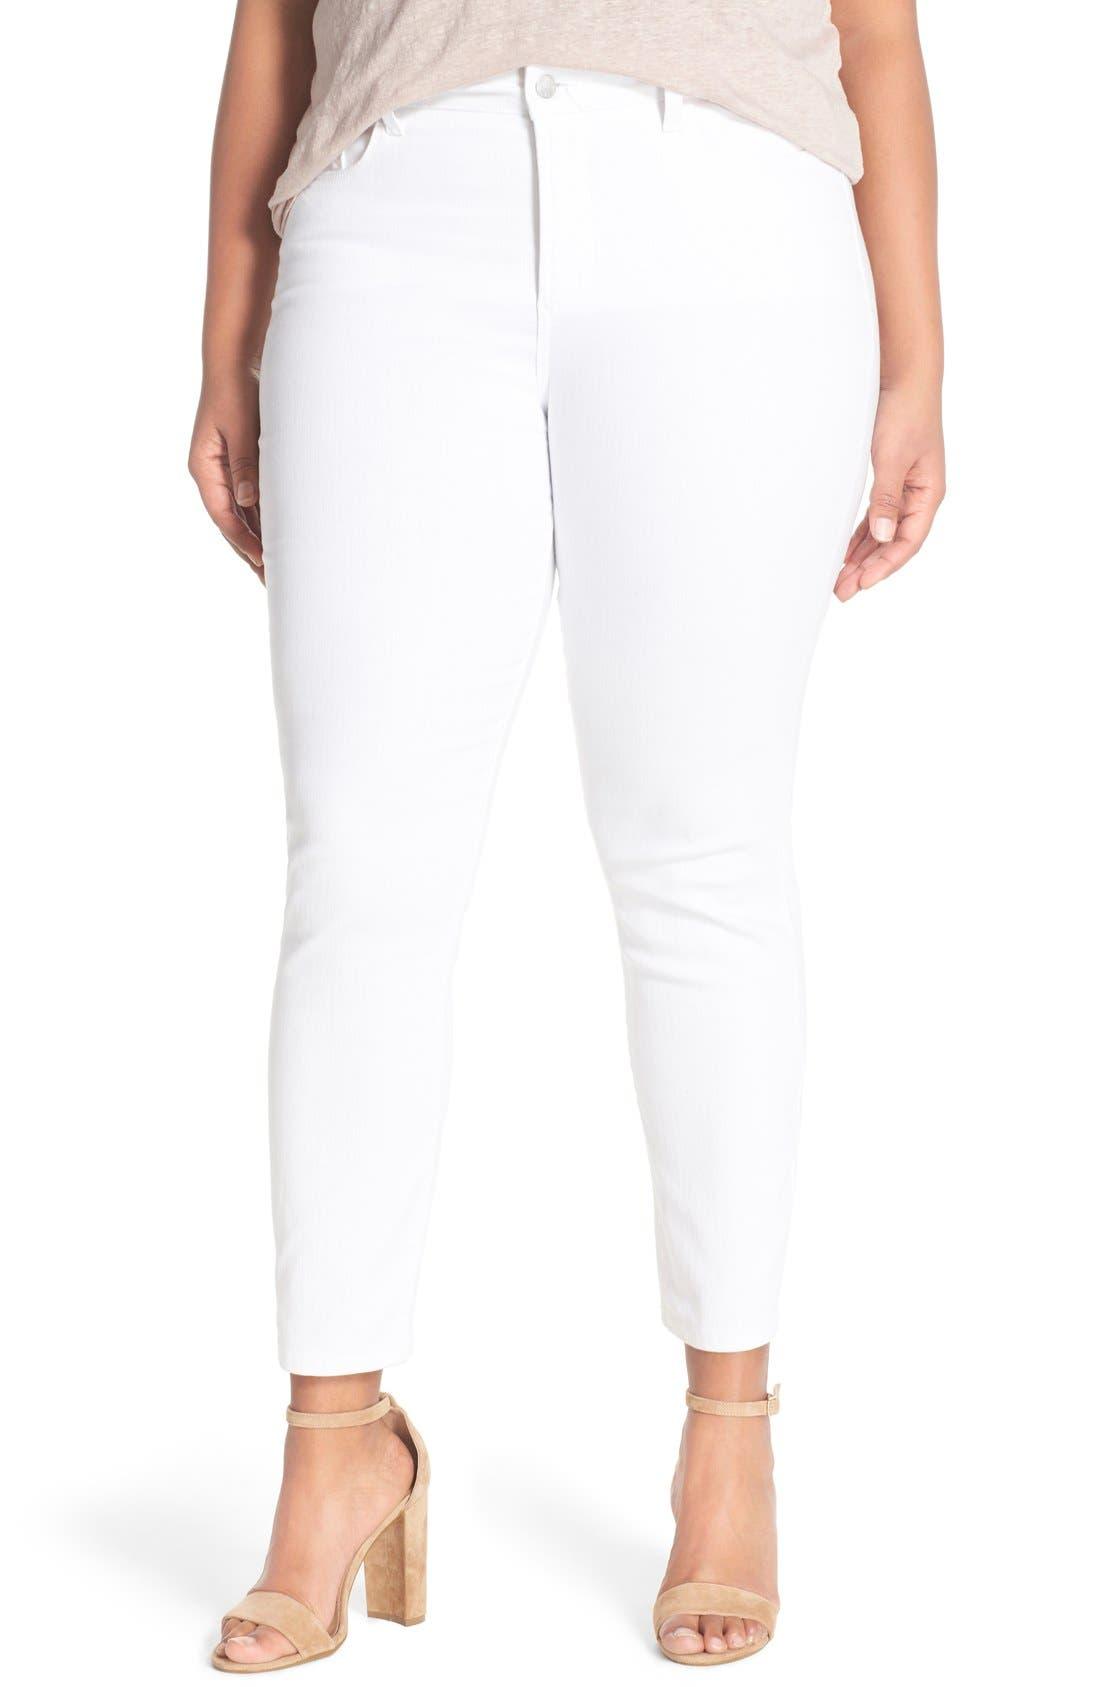 Main Image - NYDJ 'Clarissa' Stretch Slim Ankle Jeans (Plus Size)